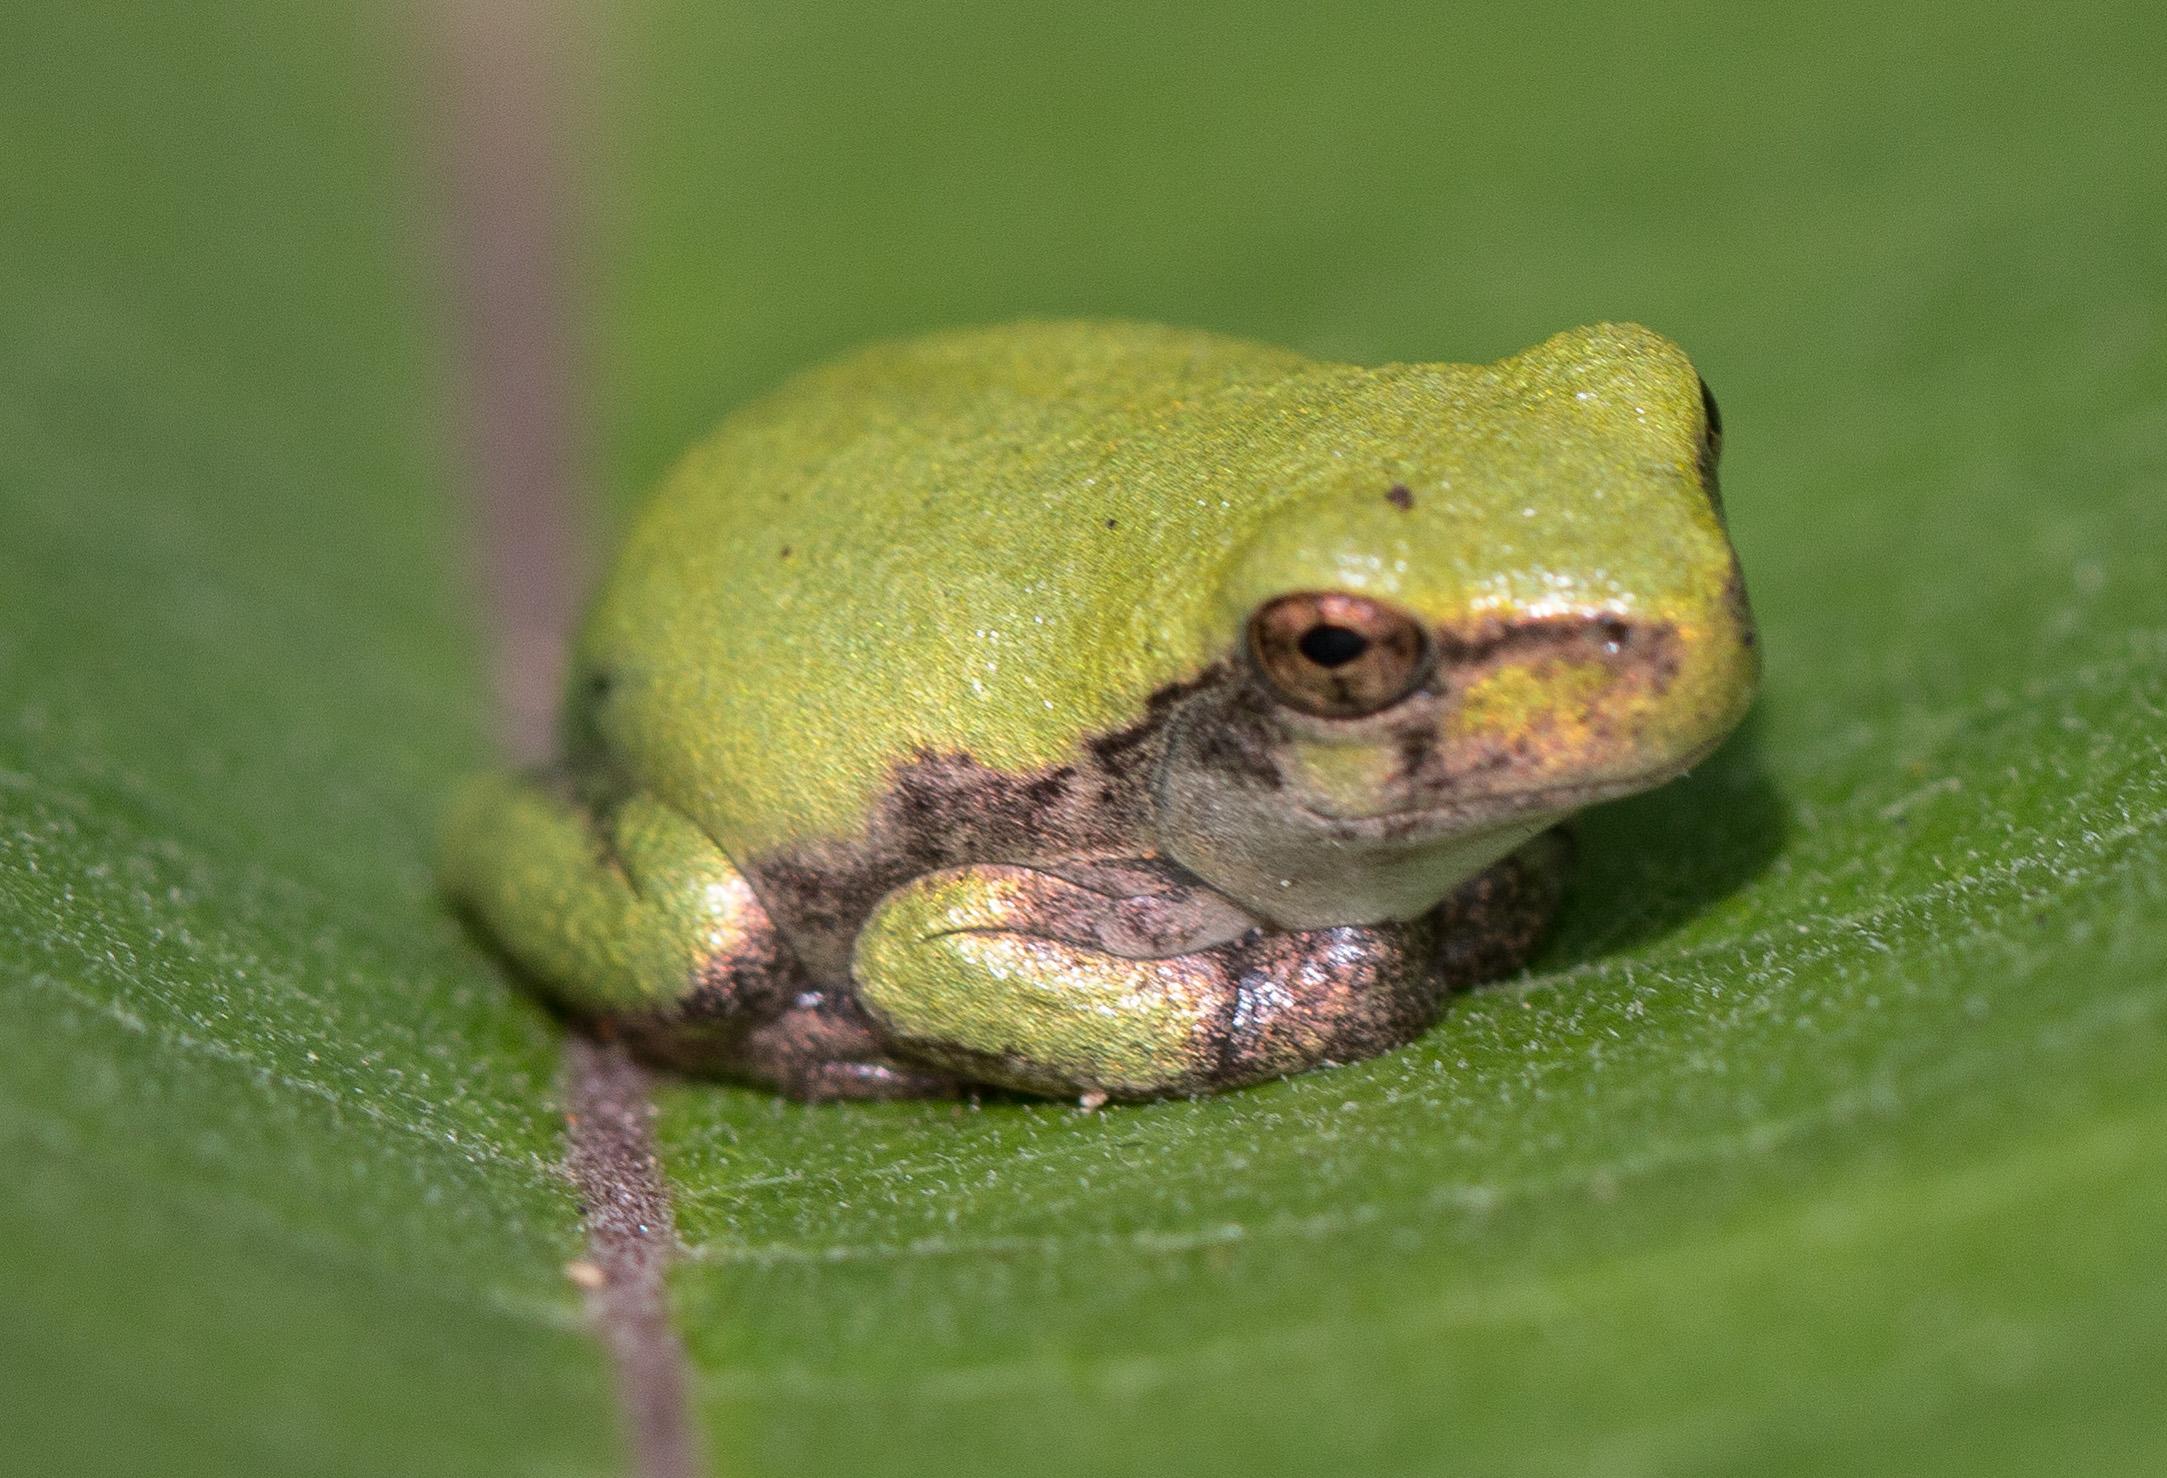 Full Size of Reptiles And Amphibians Nature Inquiries Bullfrog Sofa Wohnzimmer Bullfrog Lulu